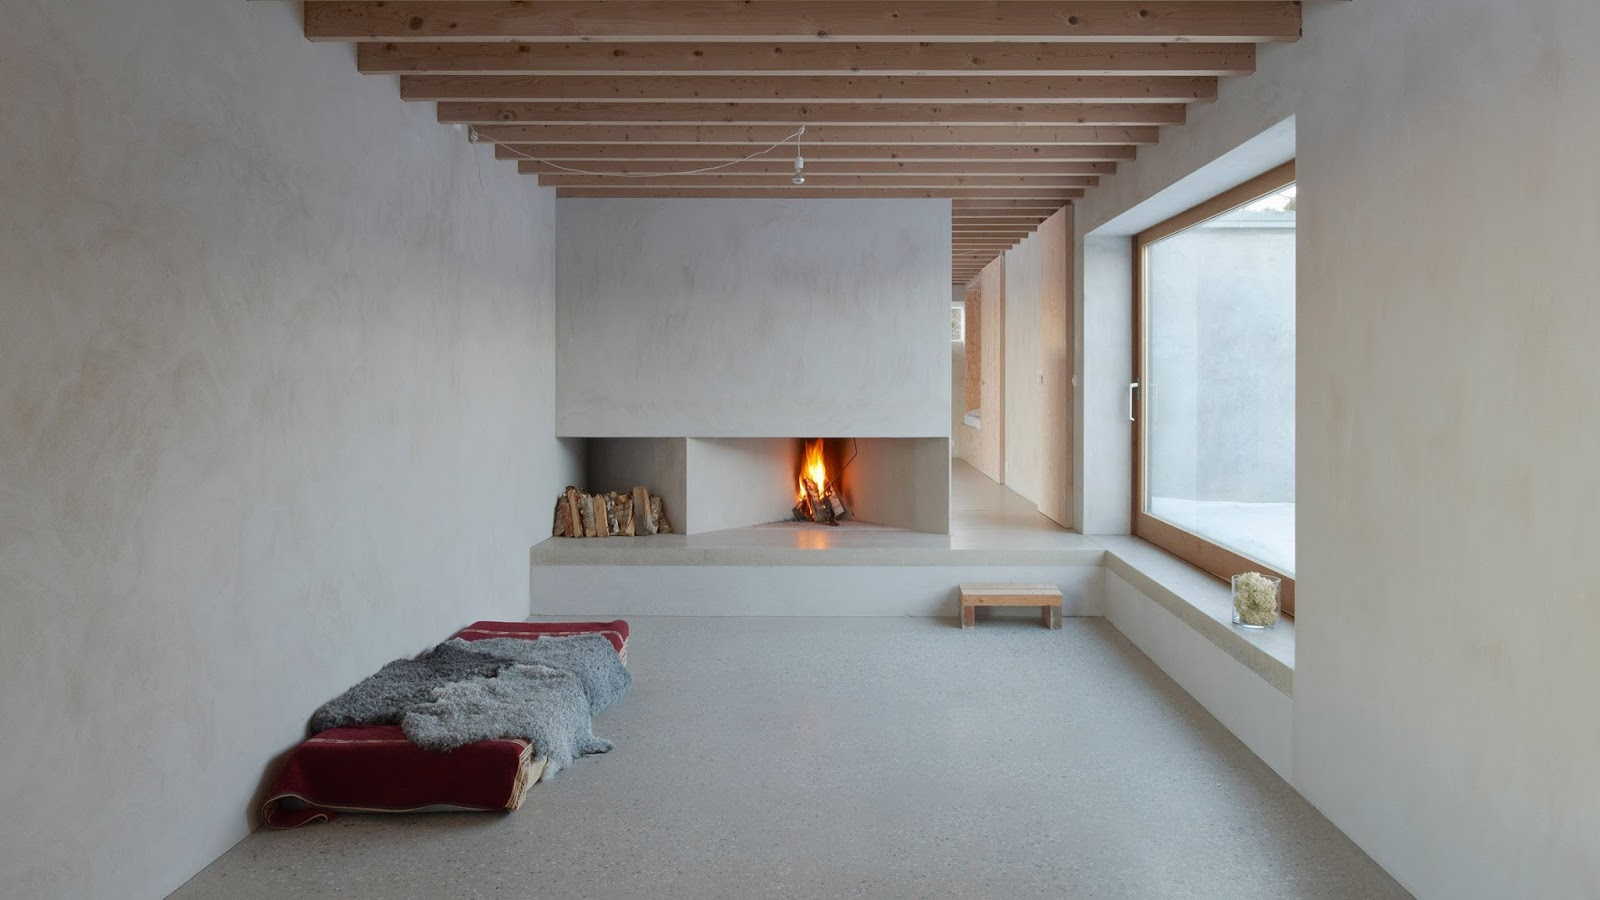 44 Gambar Rumah Yang Sederhana HD